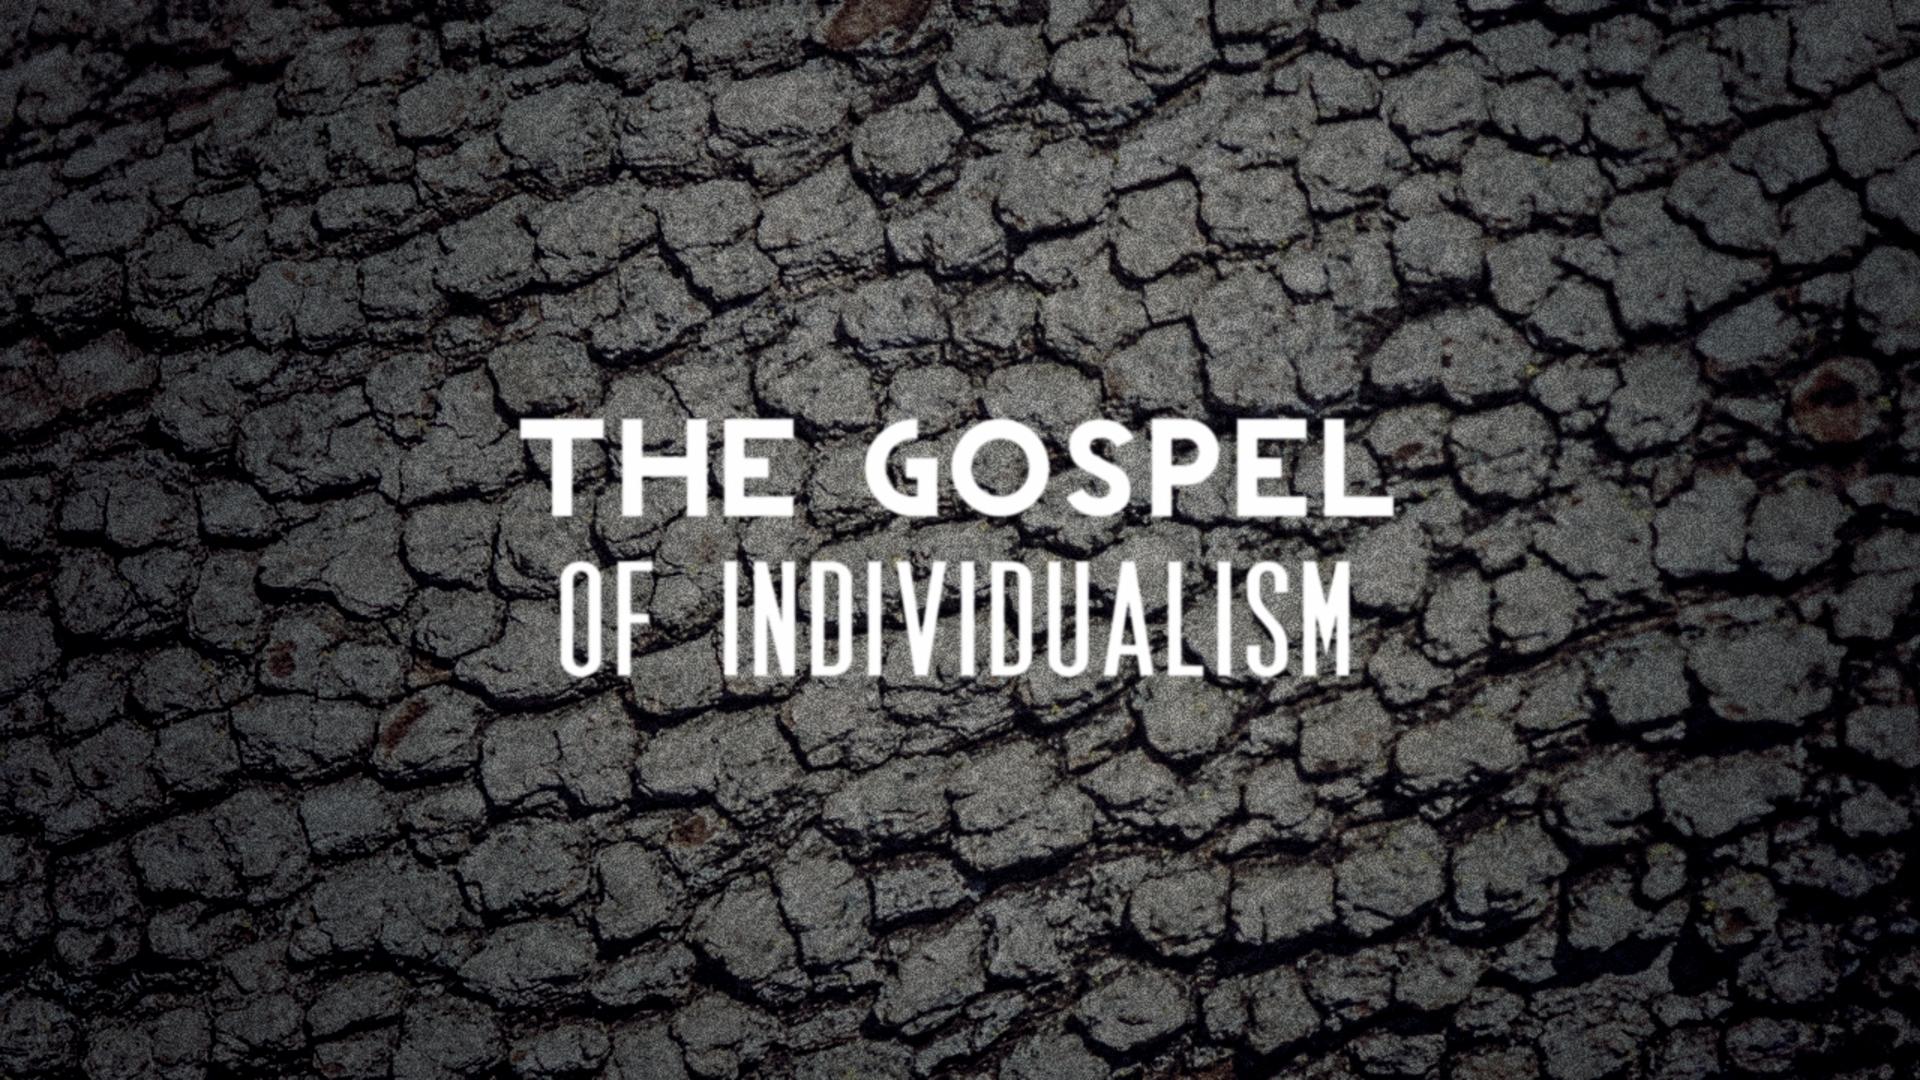 The Gospel of Individualism